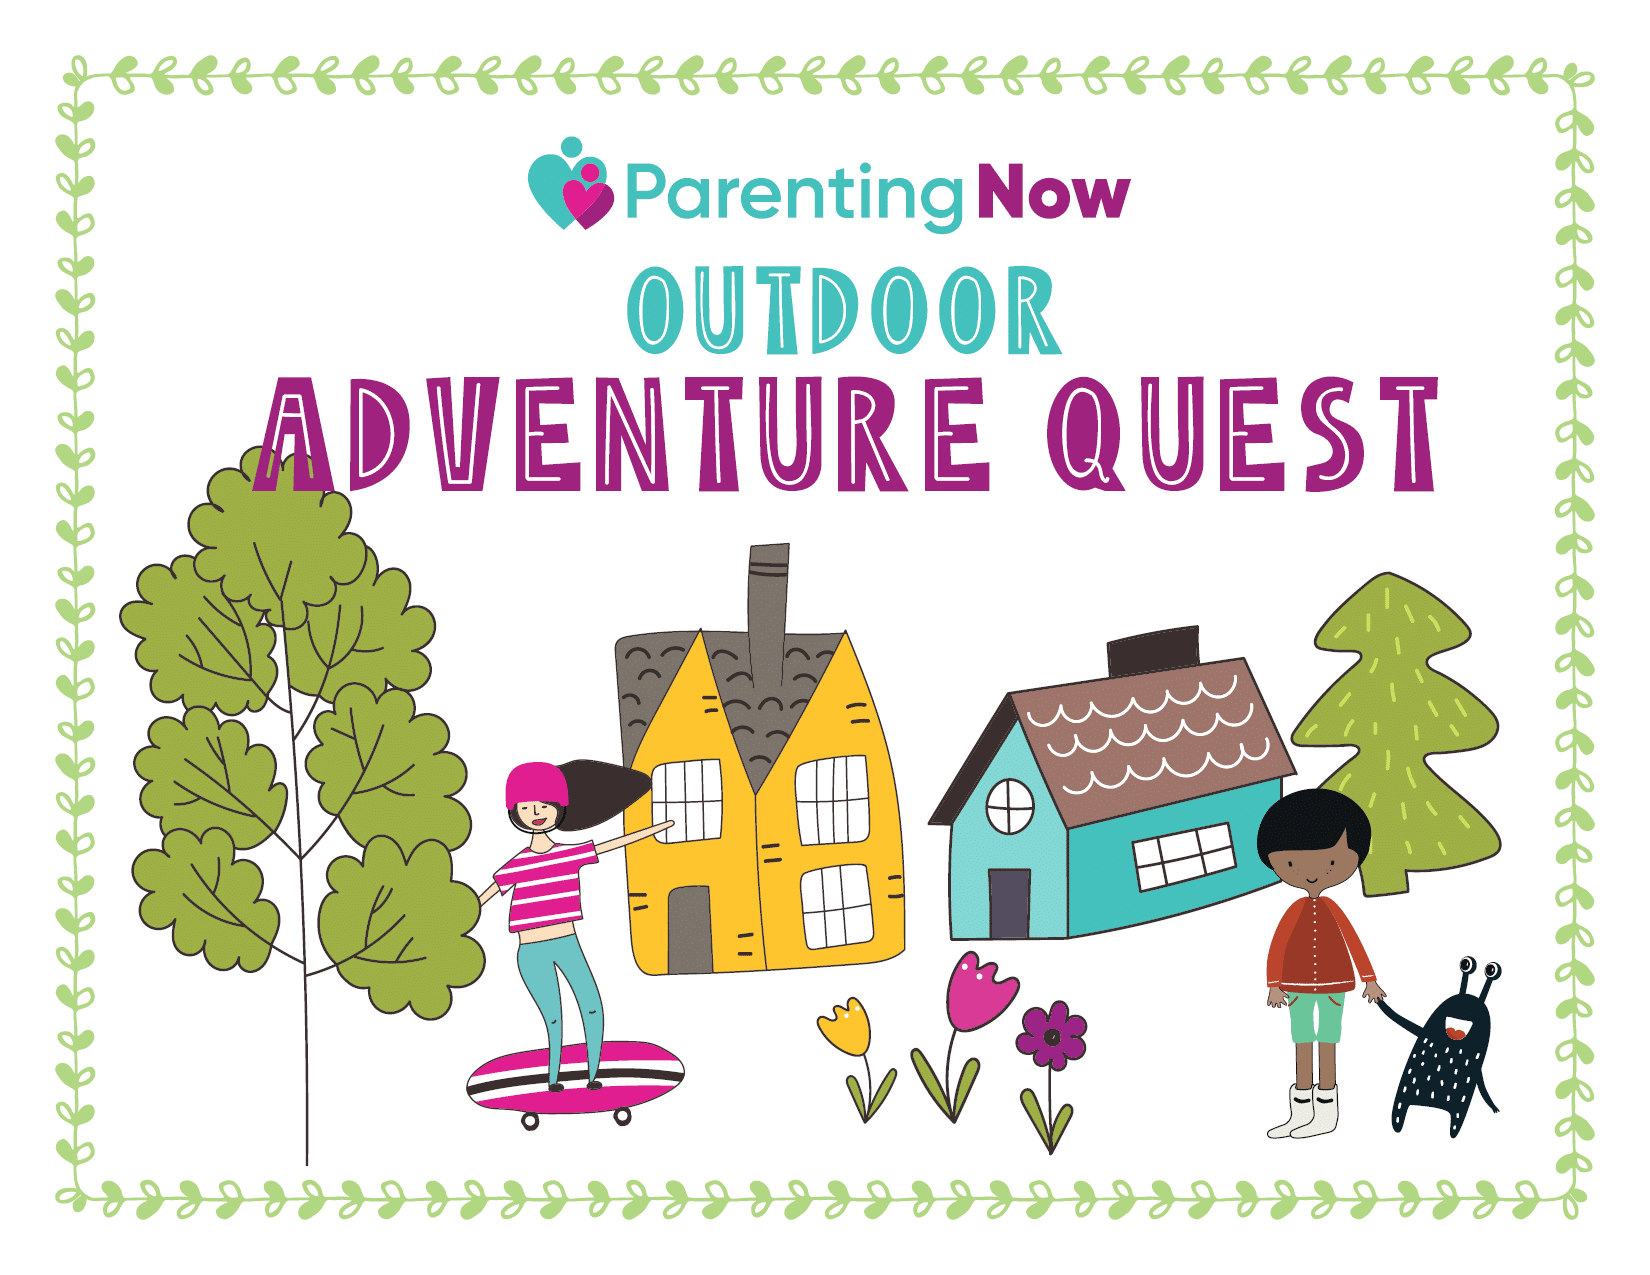 Outdoor Adventure Quest Title Image